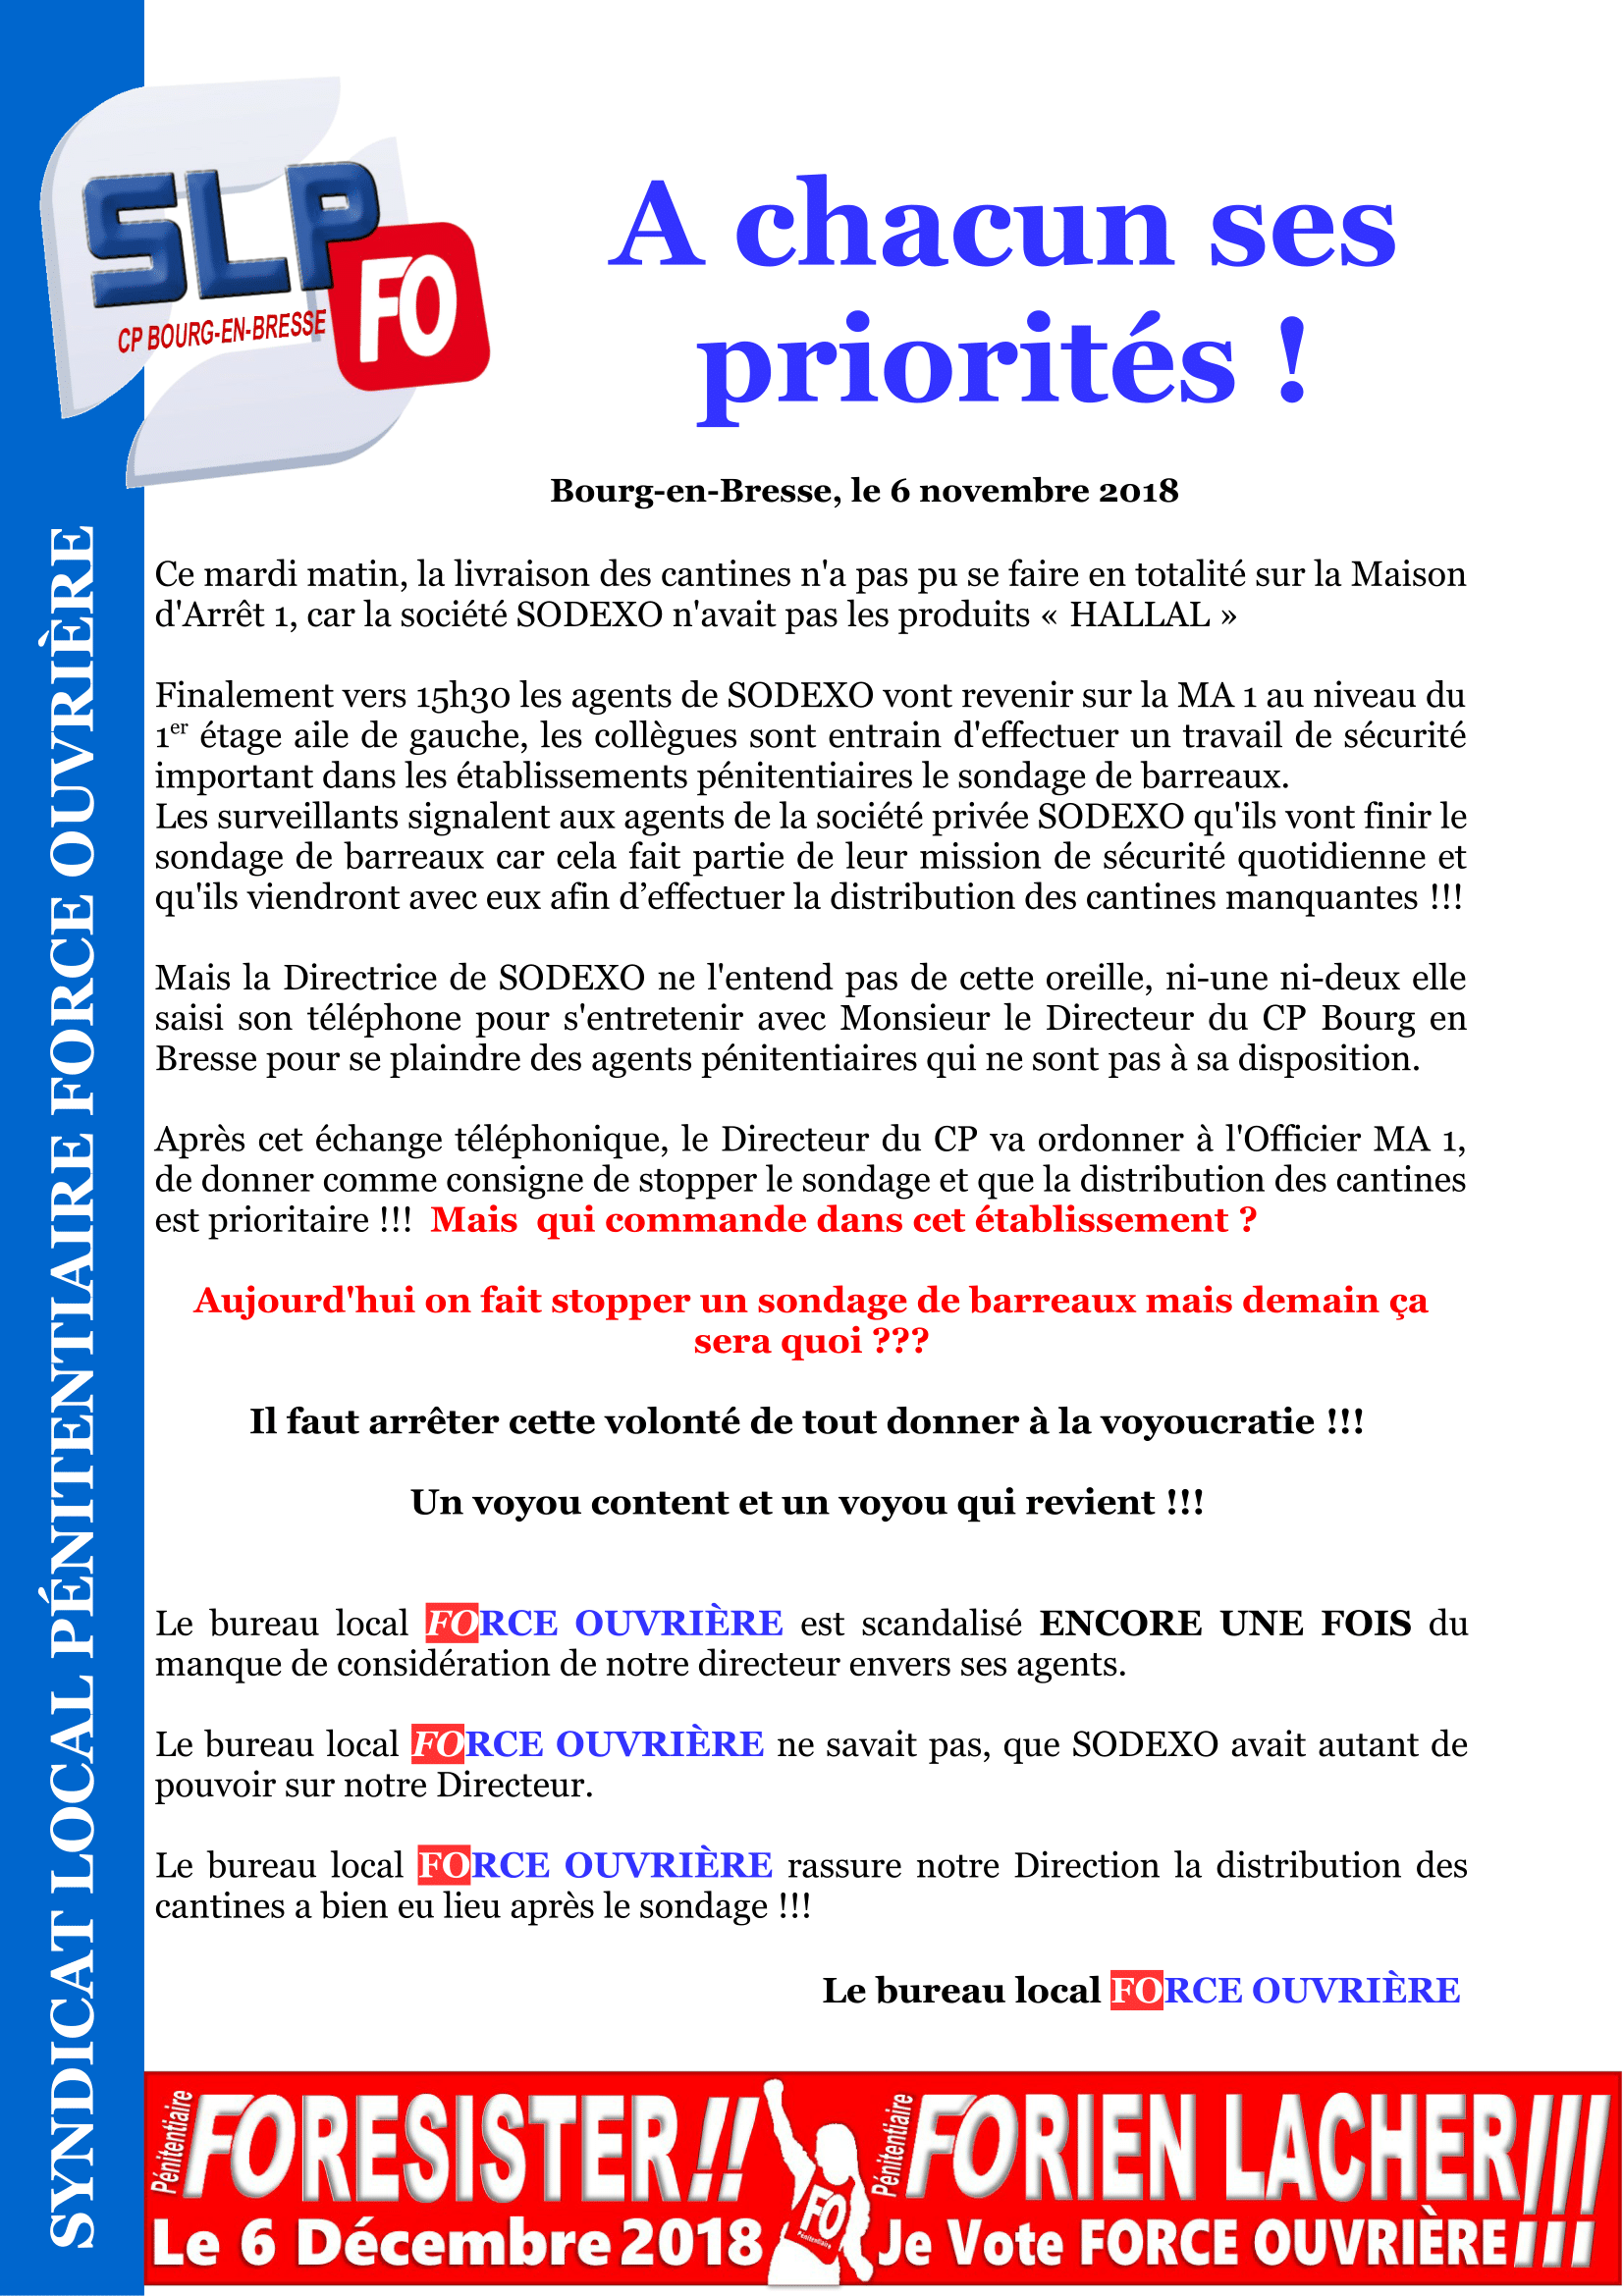 A chacun ses priorités-1